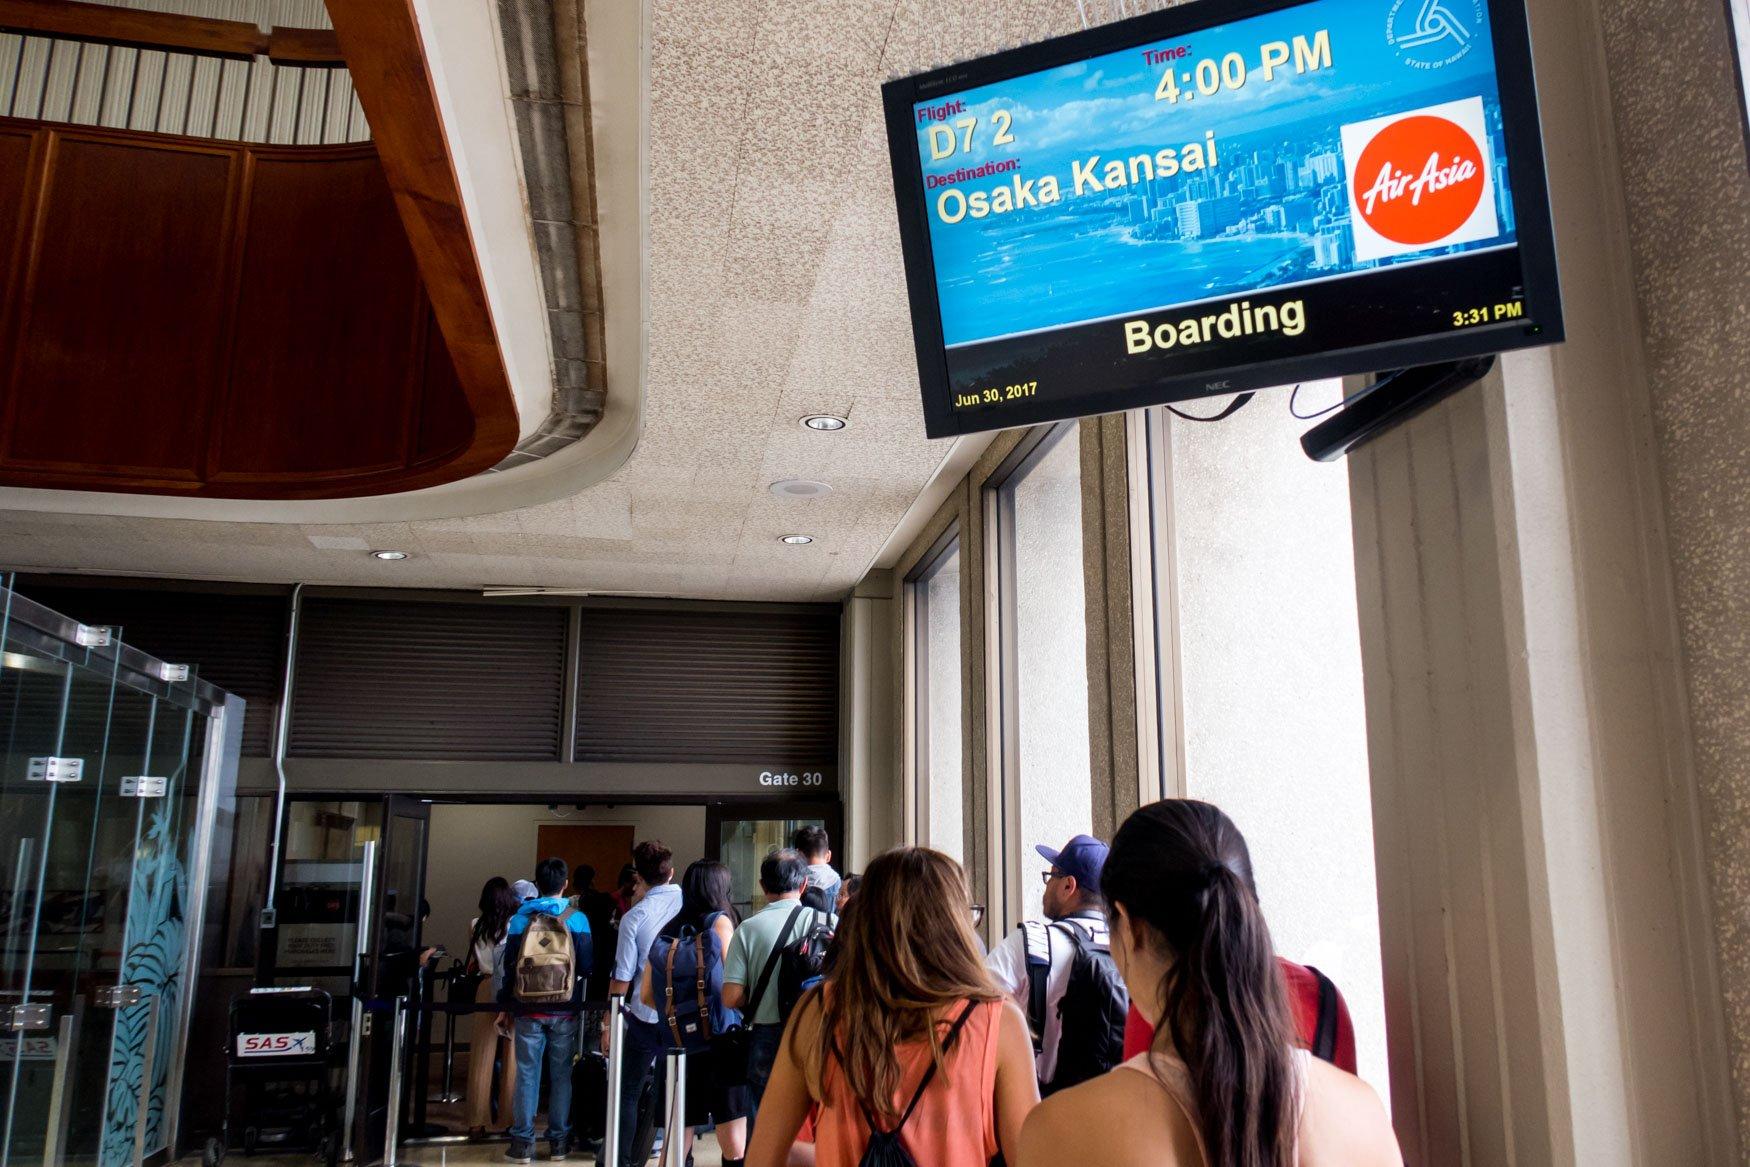 AirAsia X Boarding in Progress at Honolulu